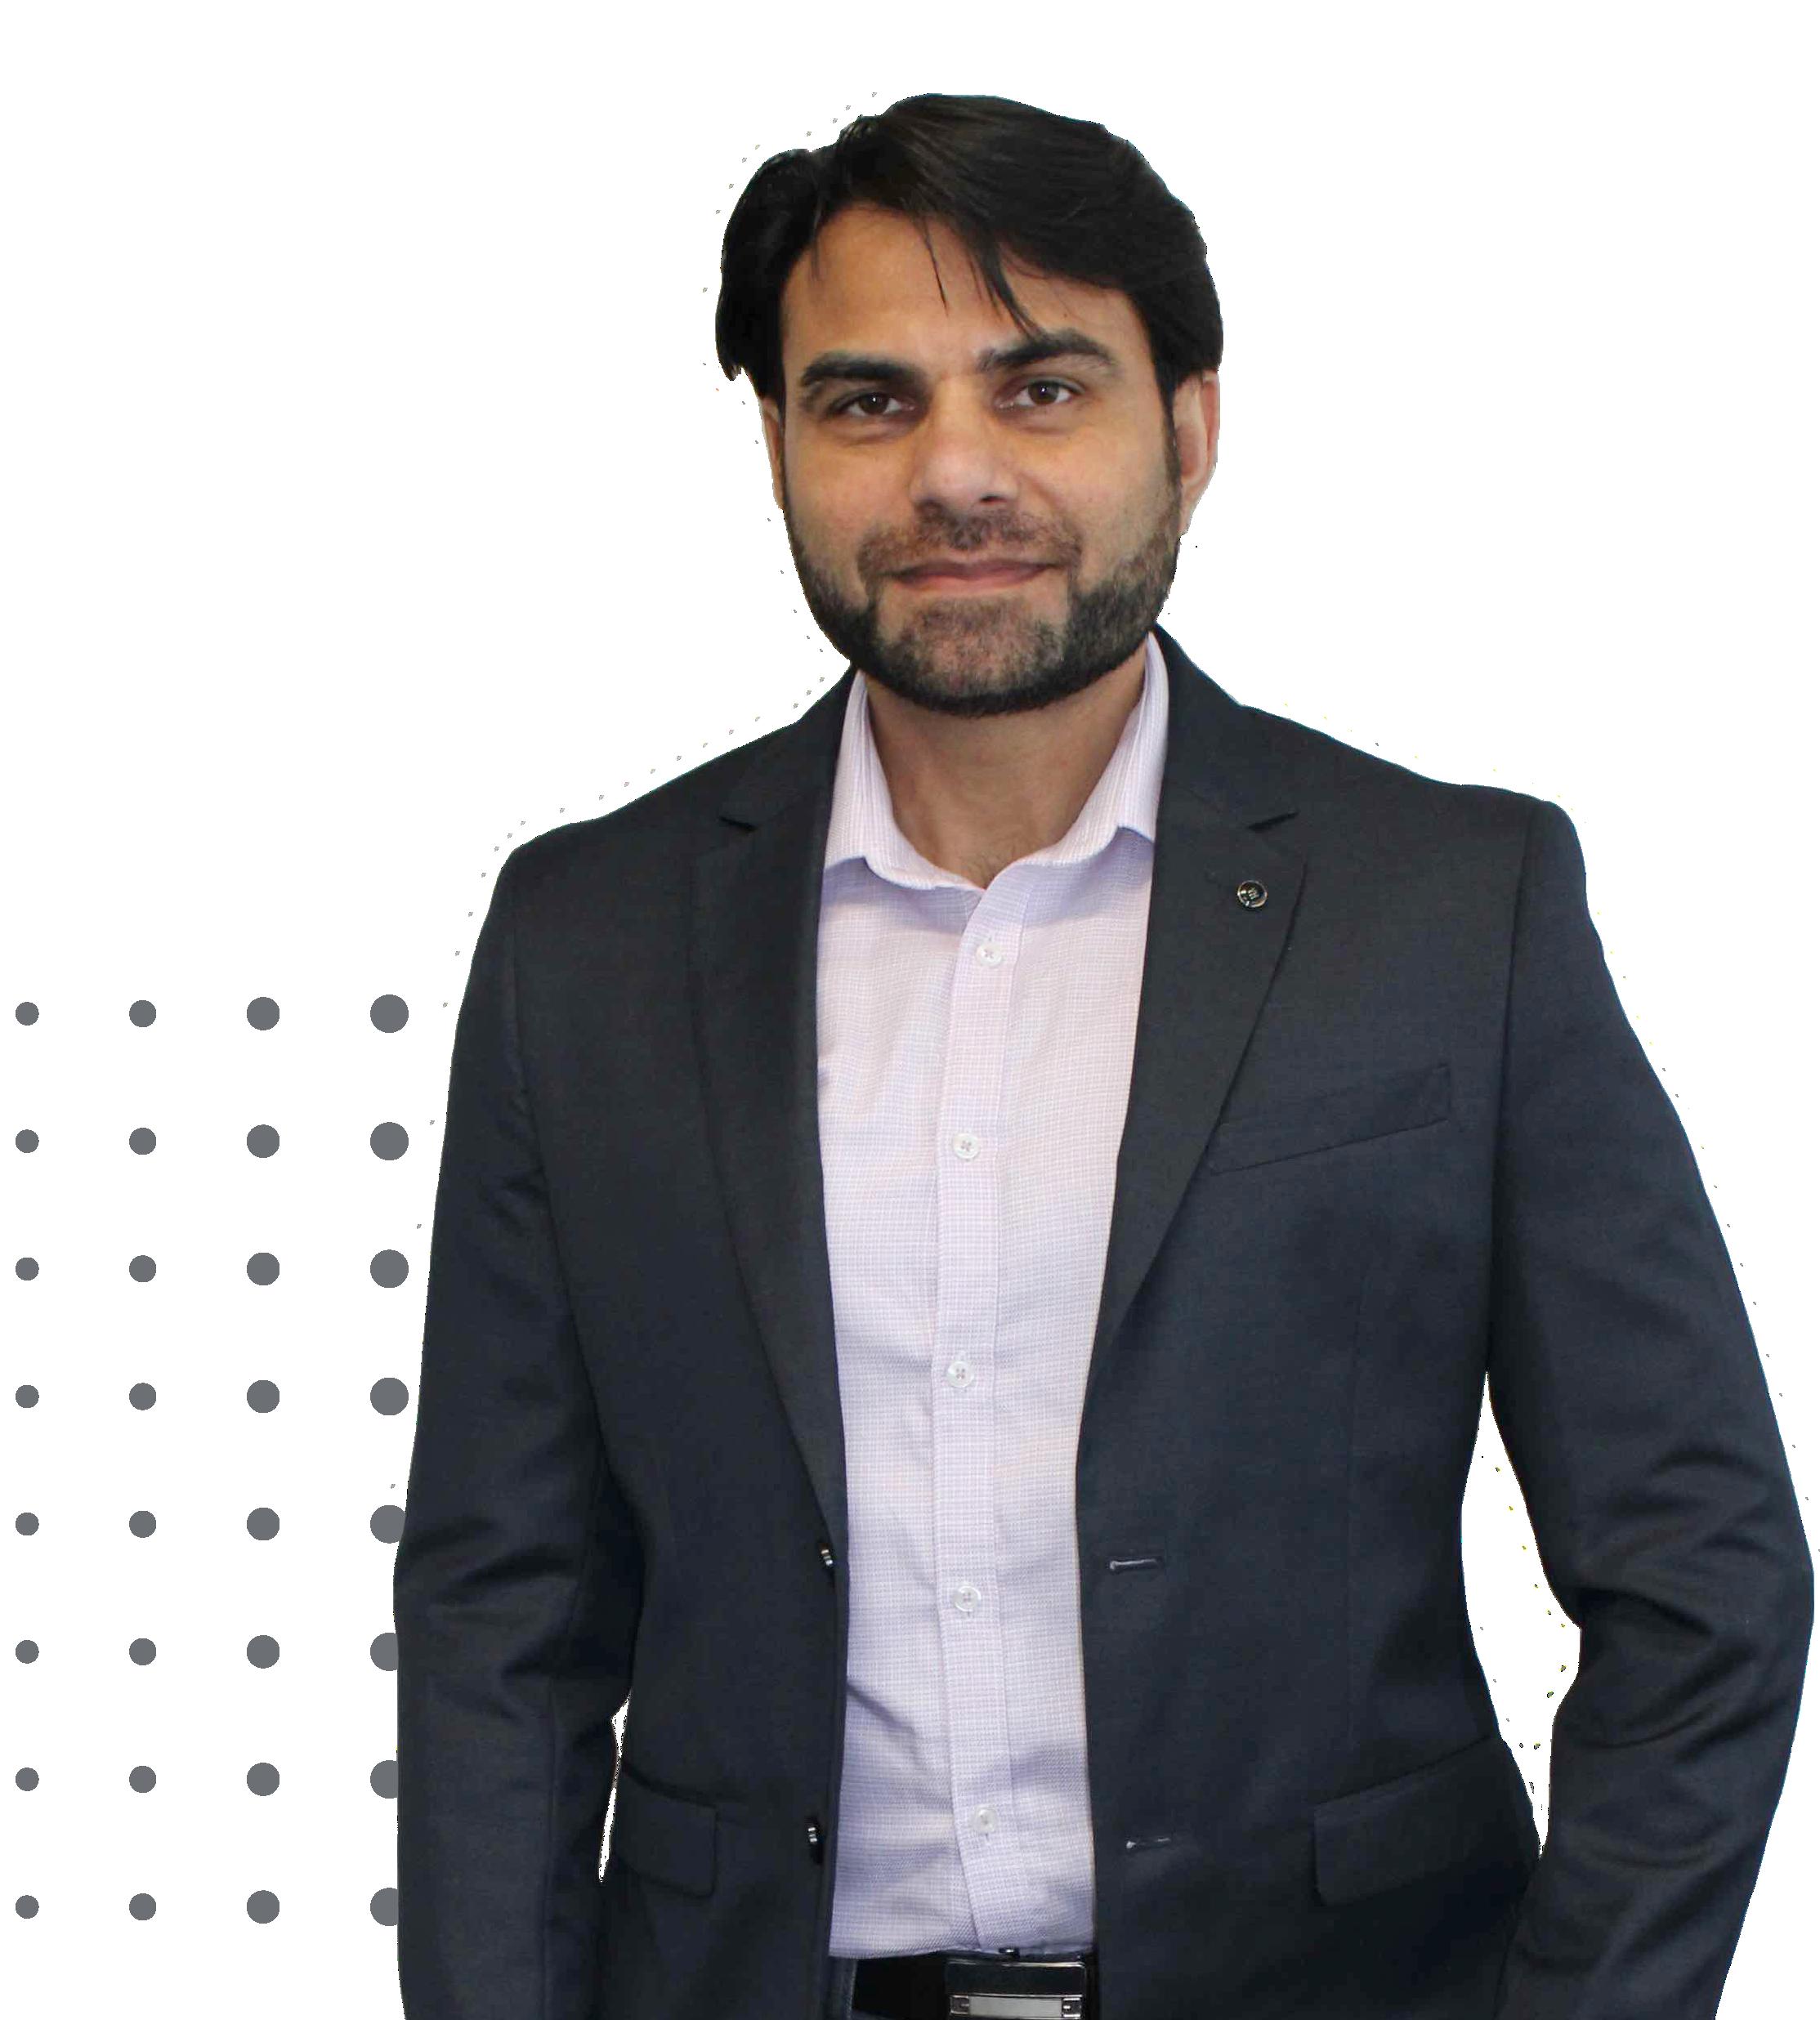 Ankur Gupta, HP Workpath App Product Owner